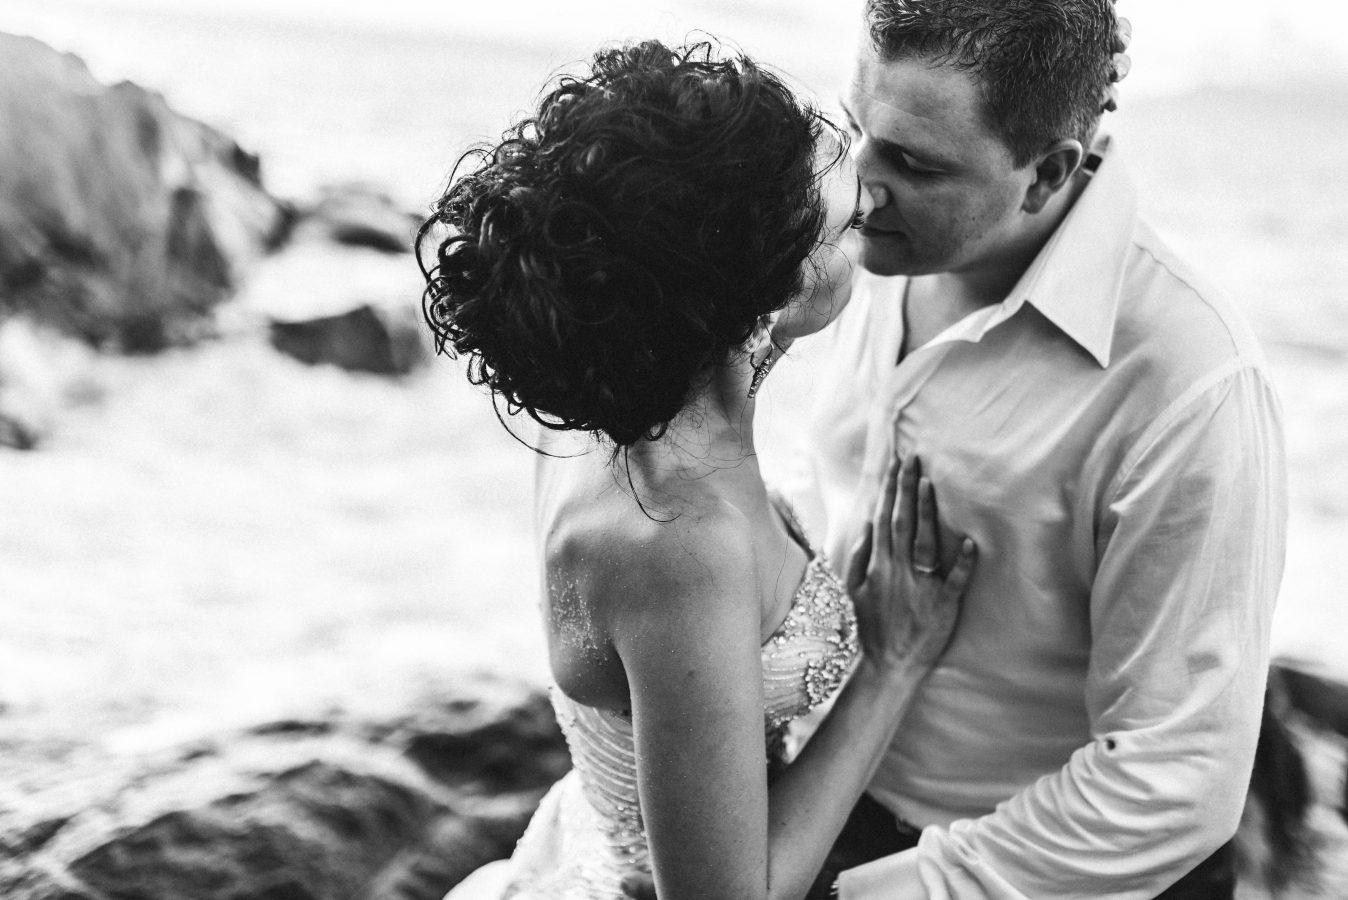 Fotos HochzeitsreportagenFotosirina rene 251115 web reportage 163